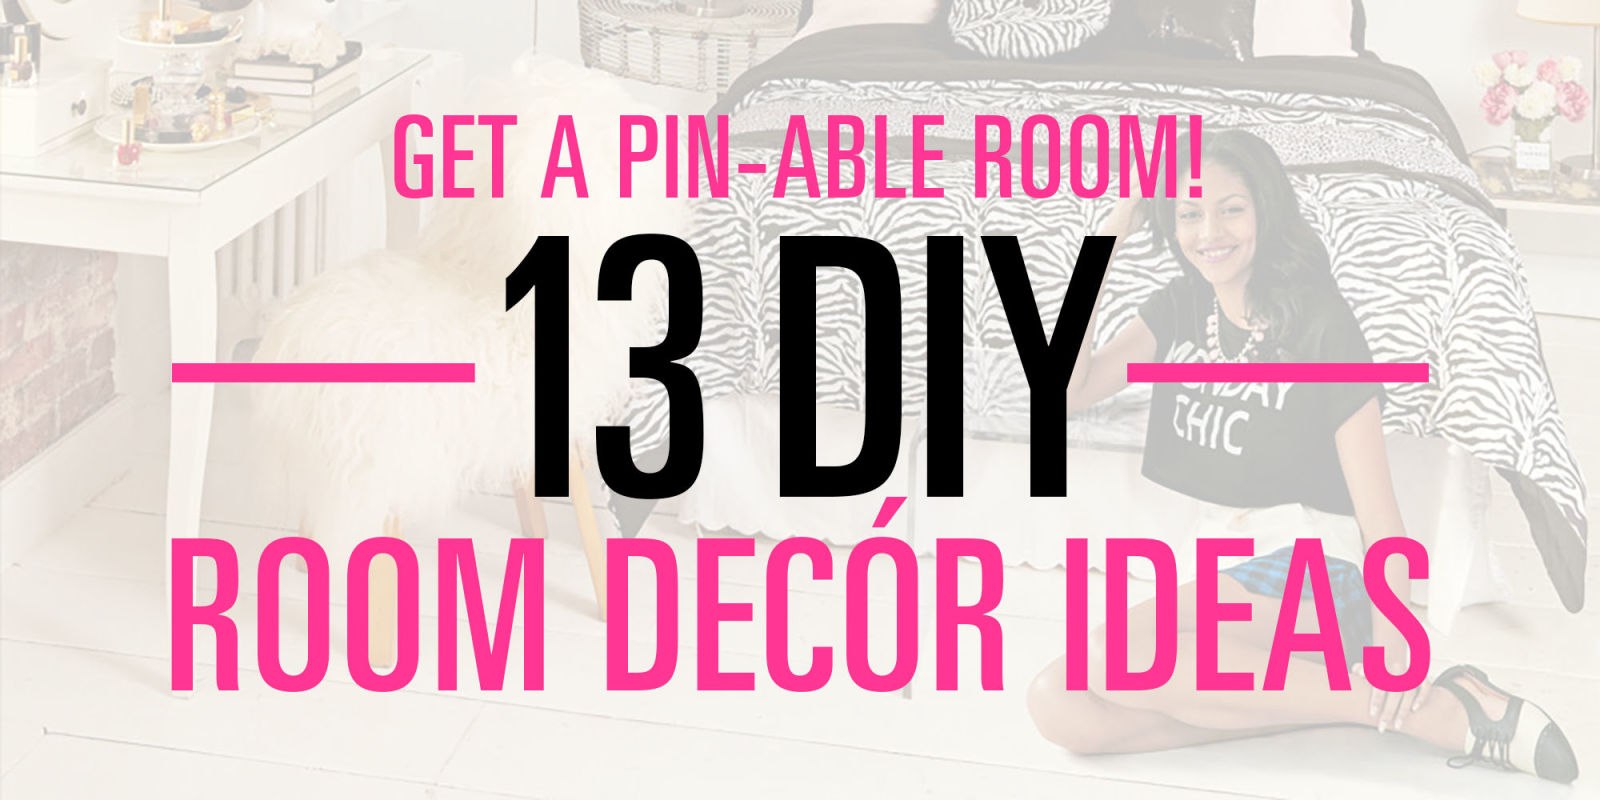 Teenage Lifestyle  Culture  amp  Teenager Articles    DIY Room Decor Ideas